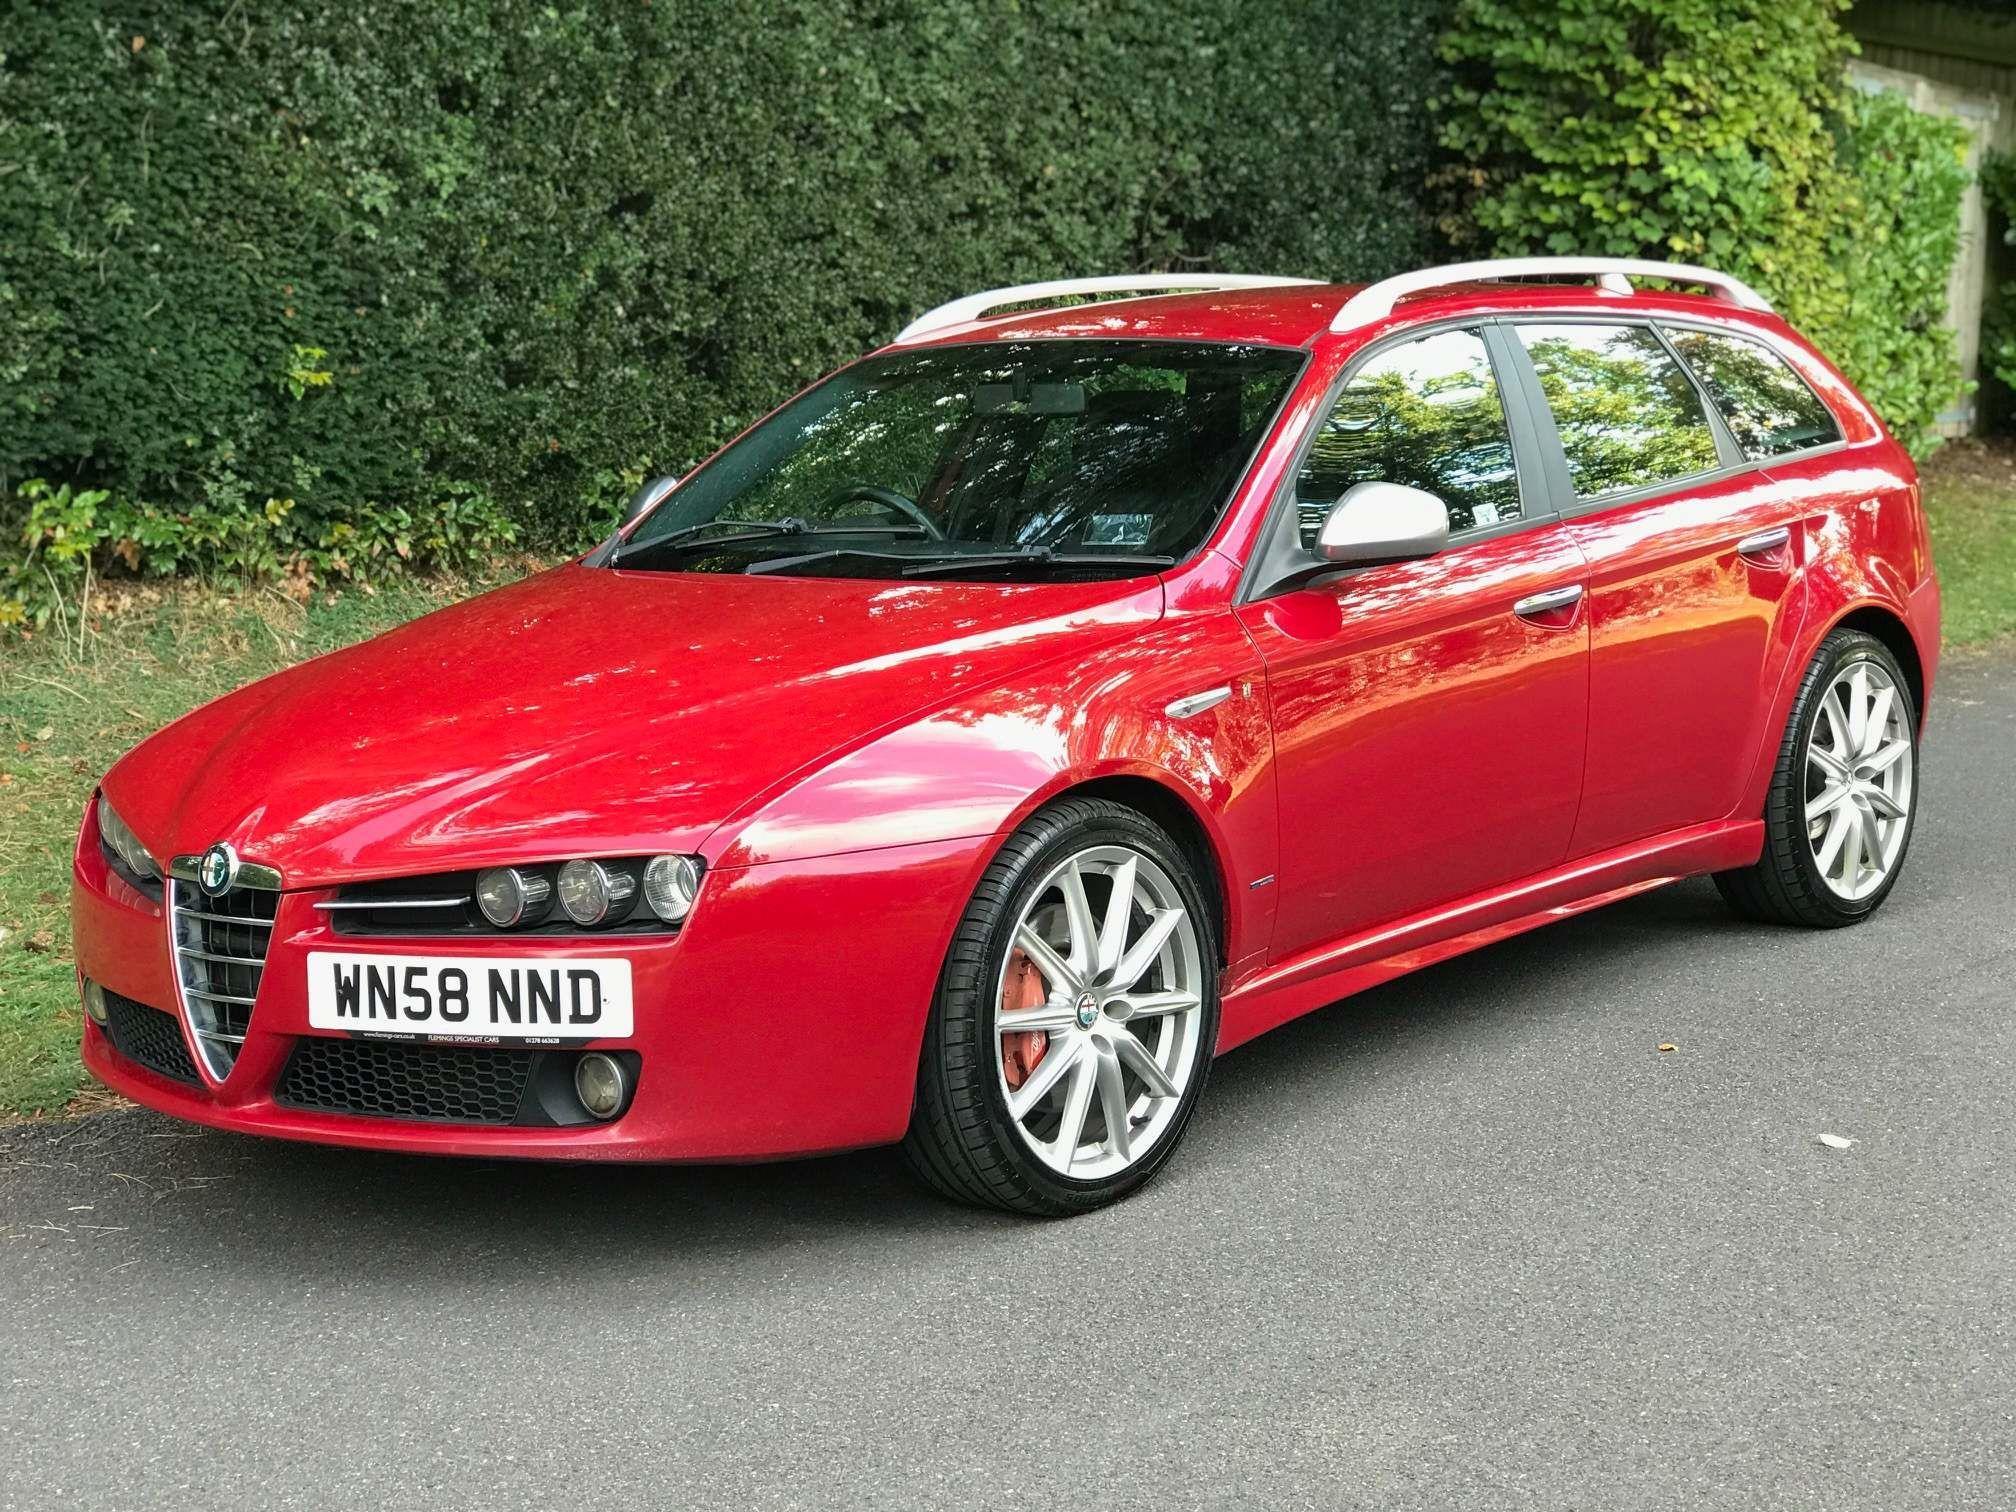 Red Alfa Romeo 159 Sportwagon Used Cars For Sale Autotrader Uk